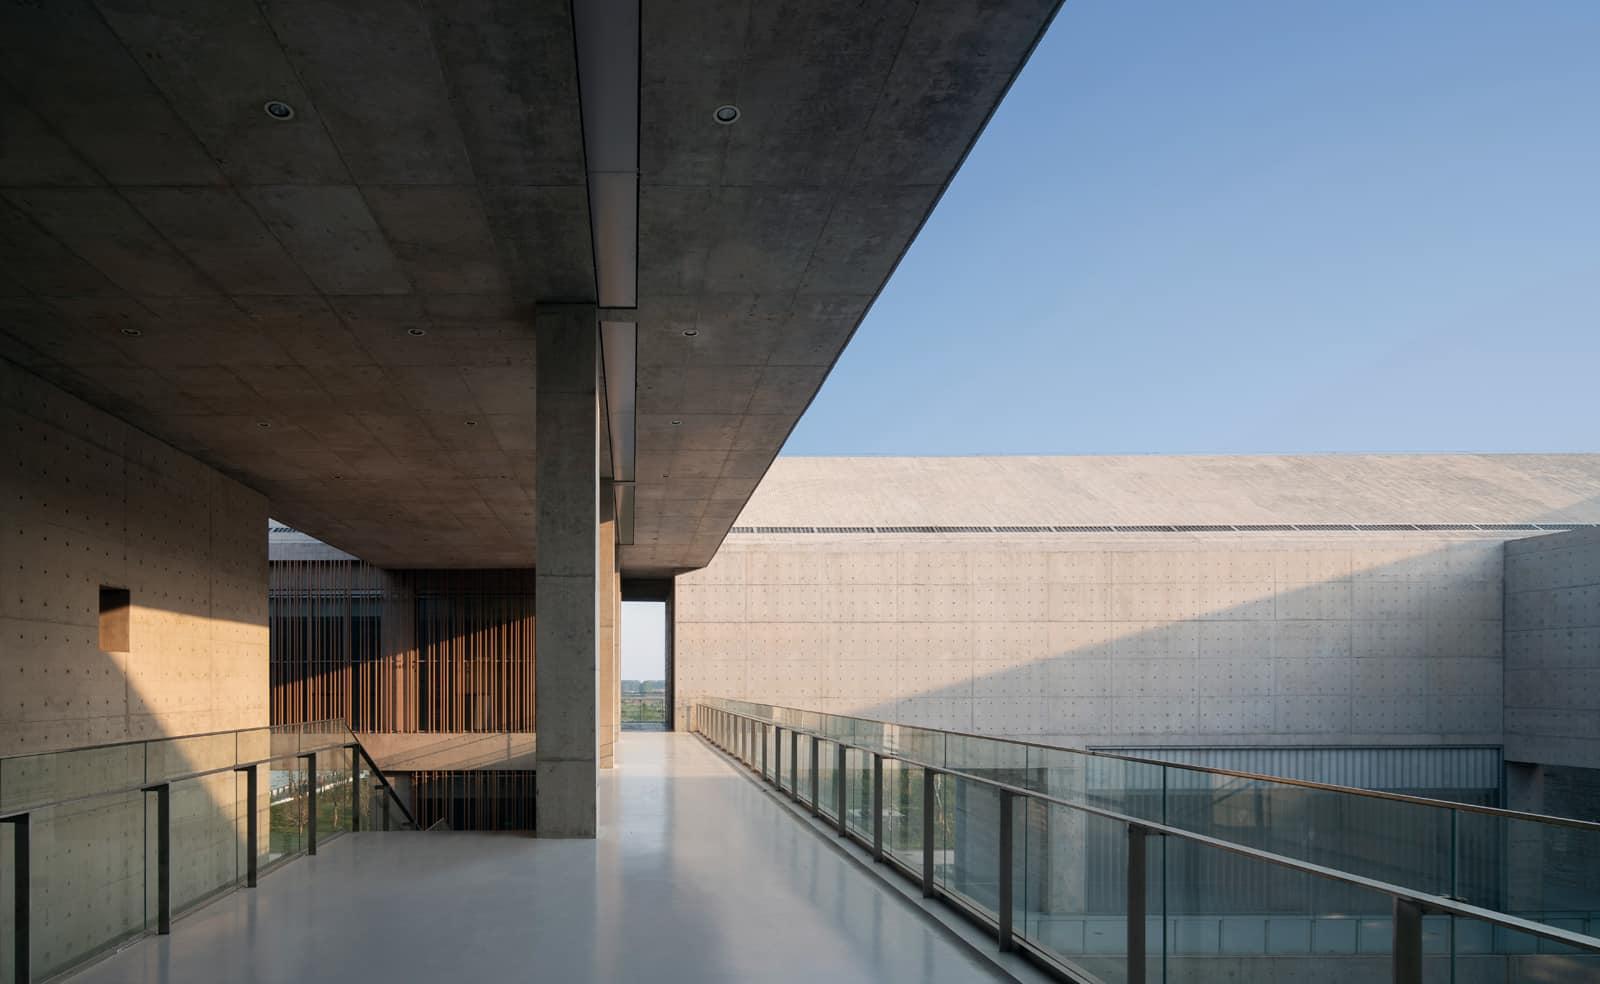 Shou County Culture and Art Center  - 20210702 Zhu Pei ShouCountyCultureArtCenter 10 53